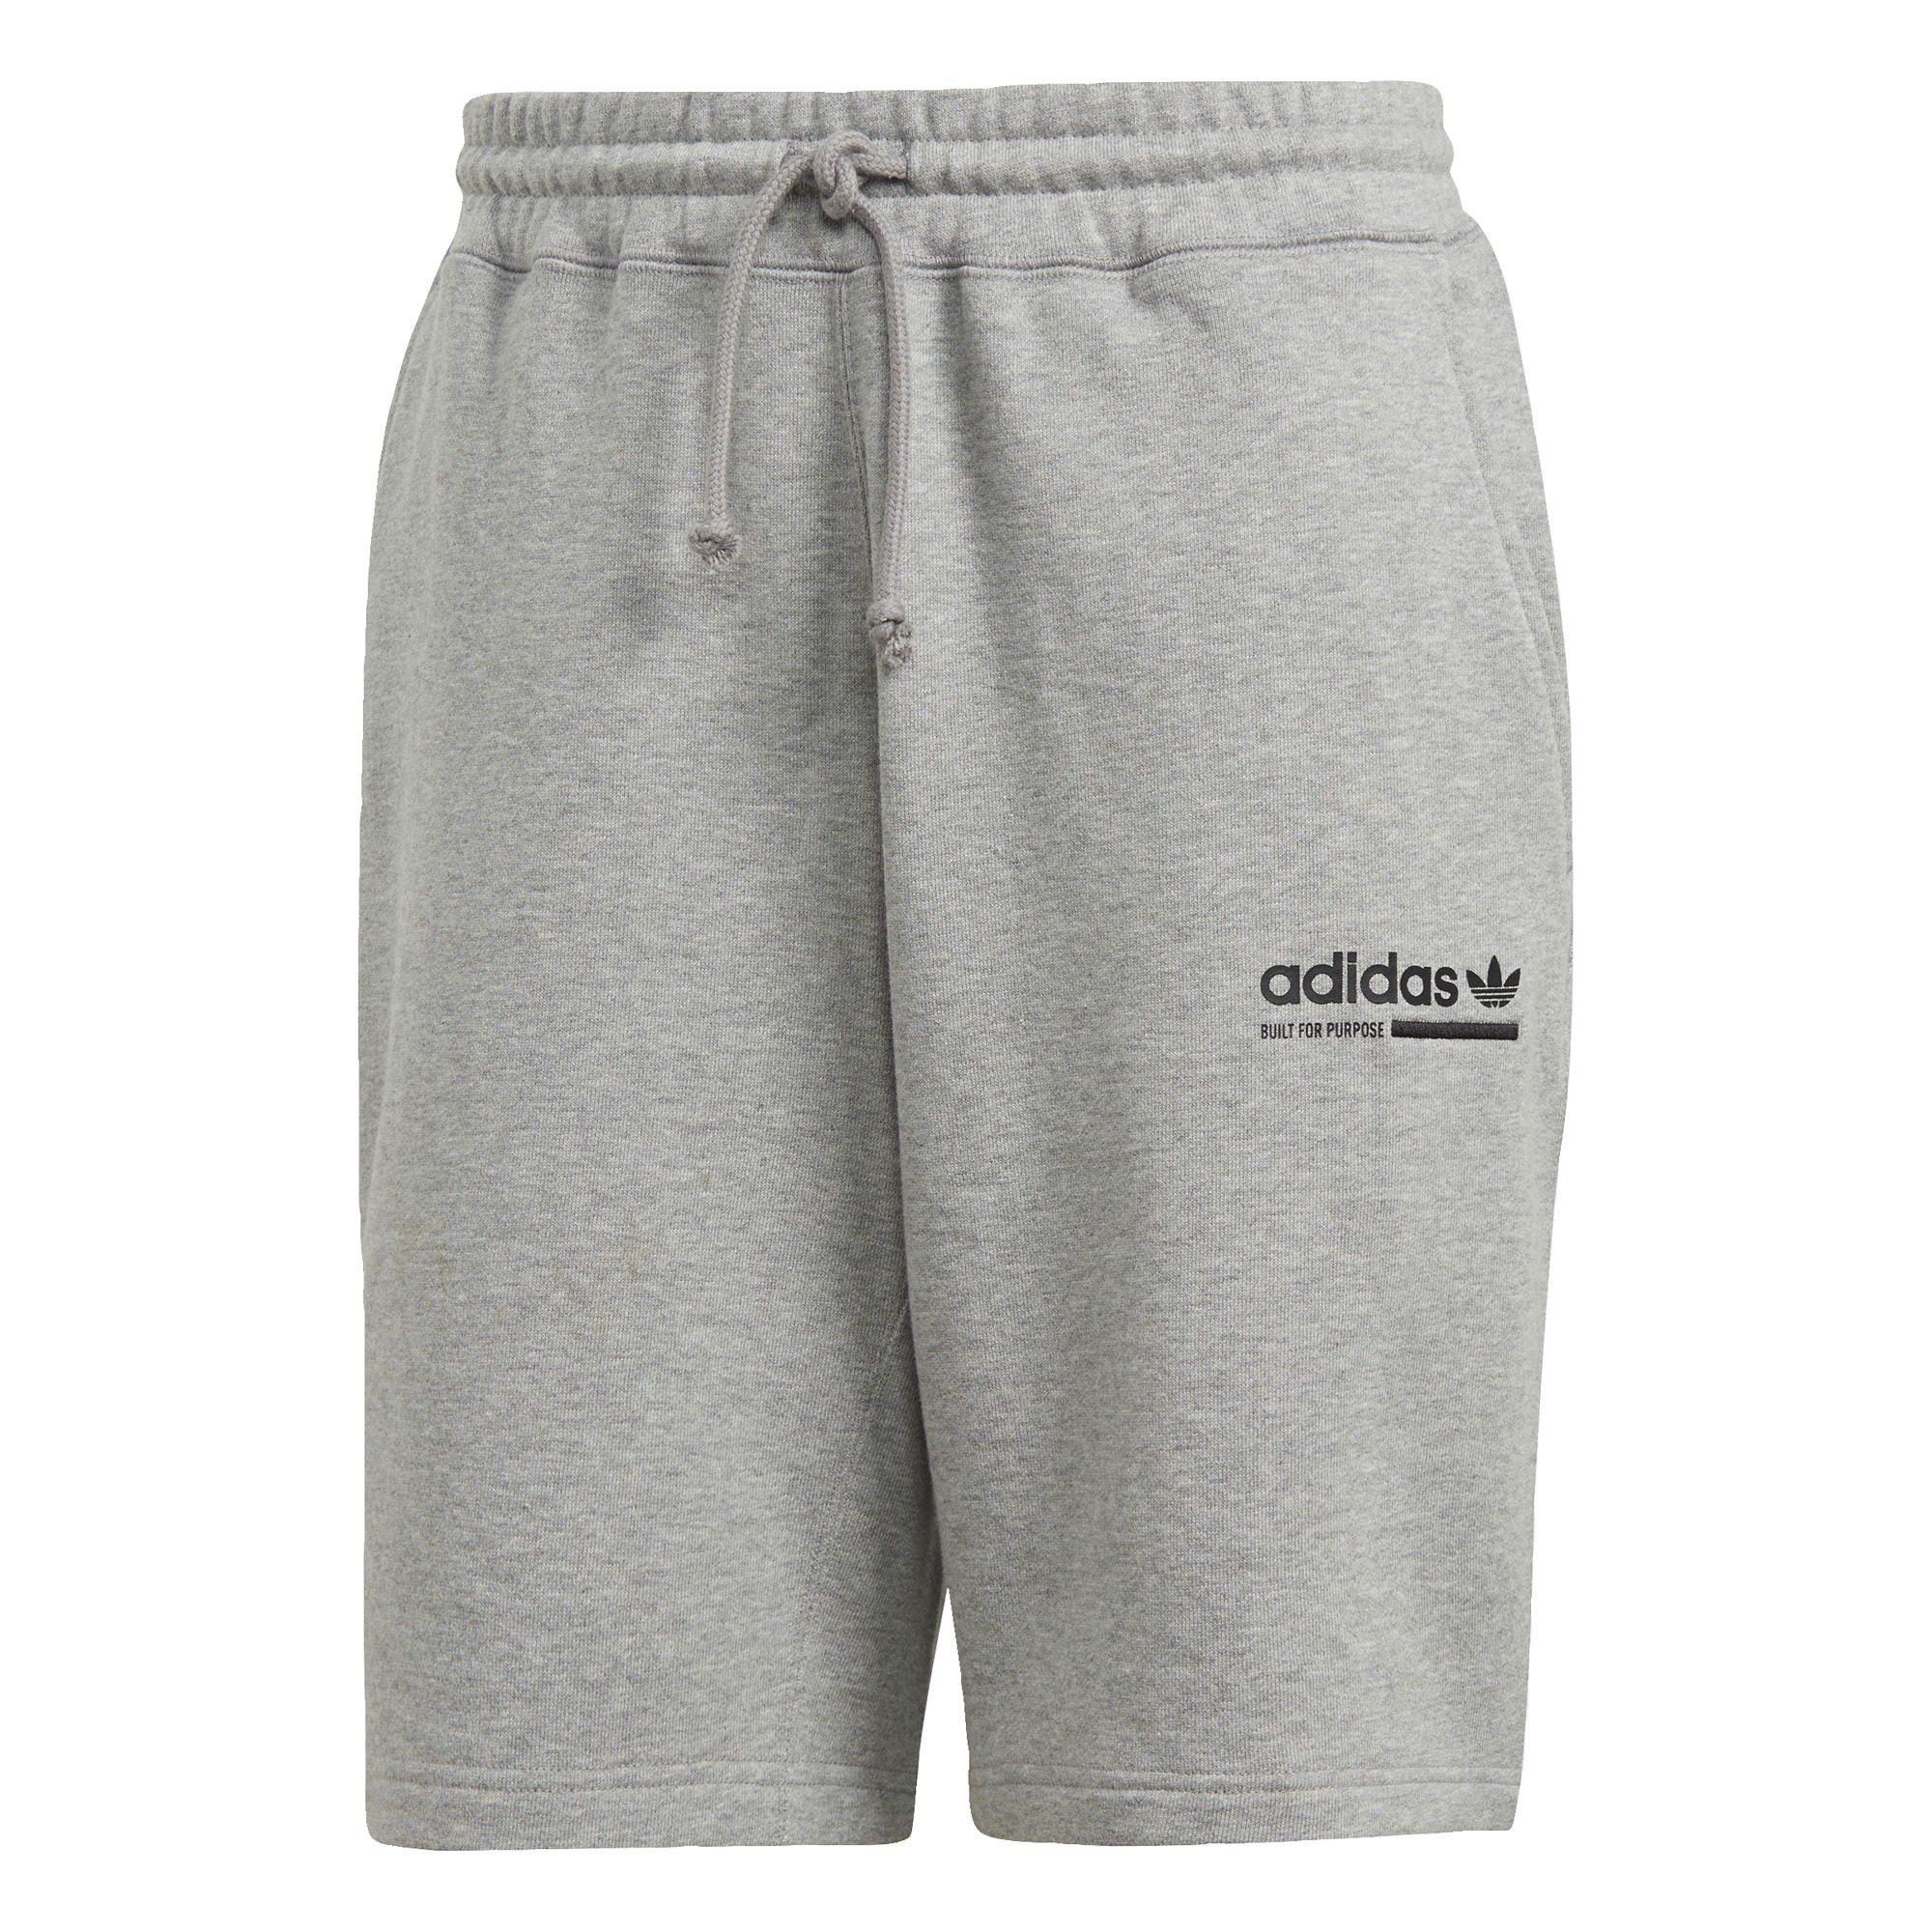 Neueste Adidas Ultimate Knit Kurze Hose Adidas Sport